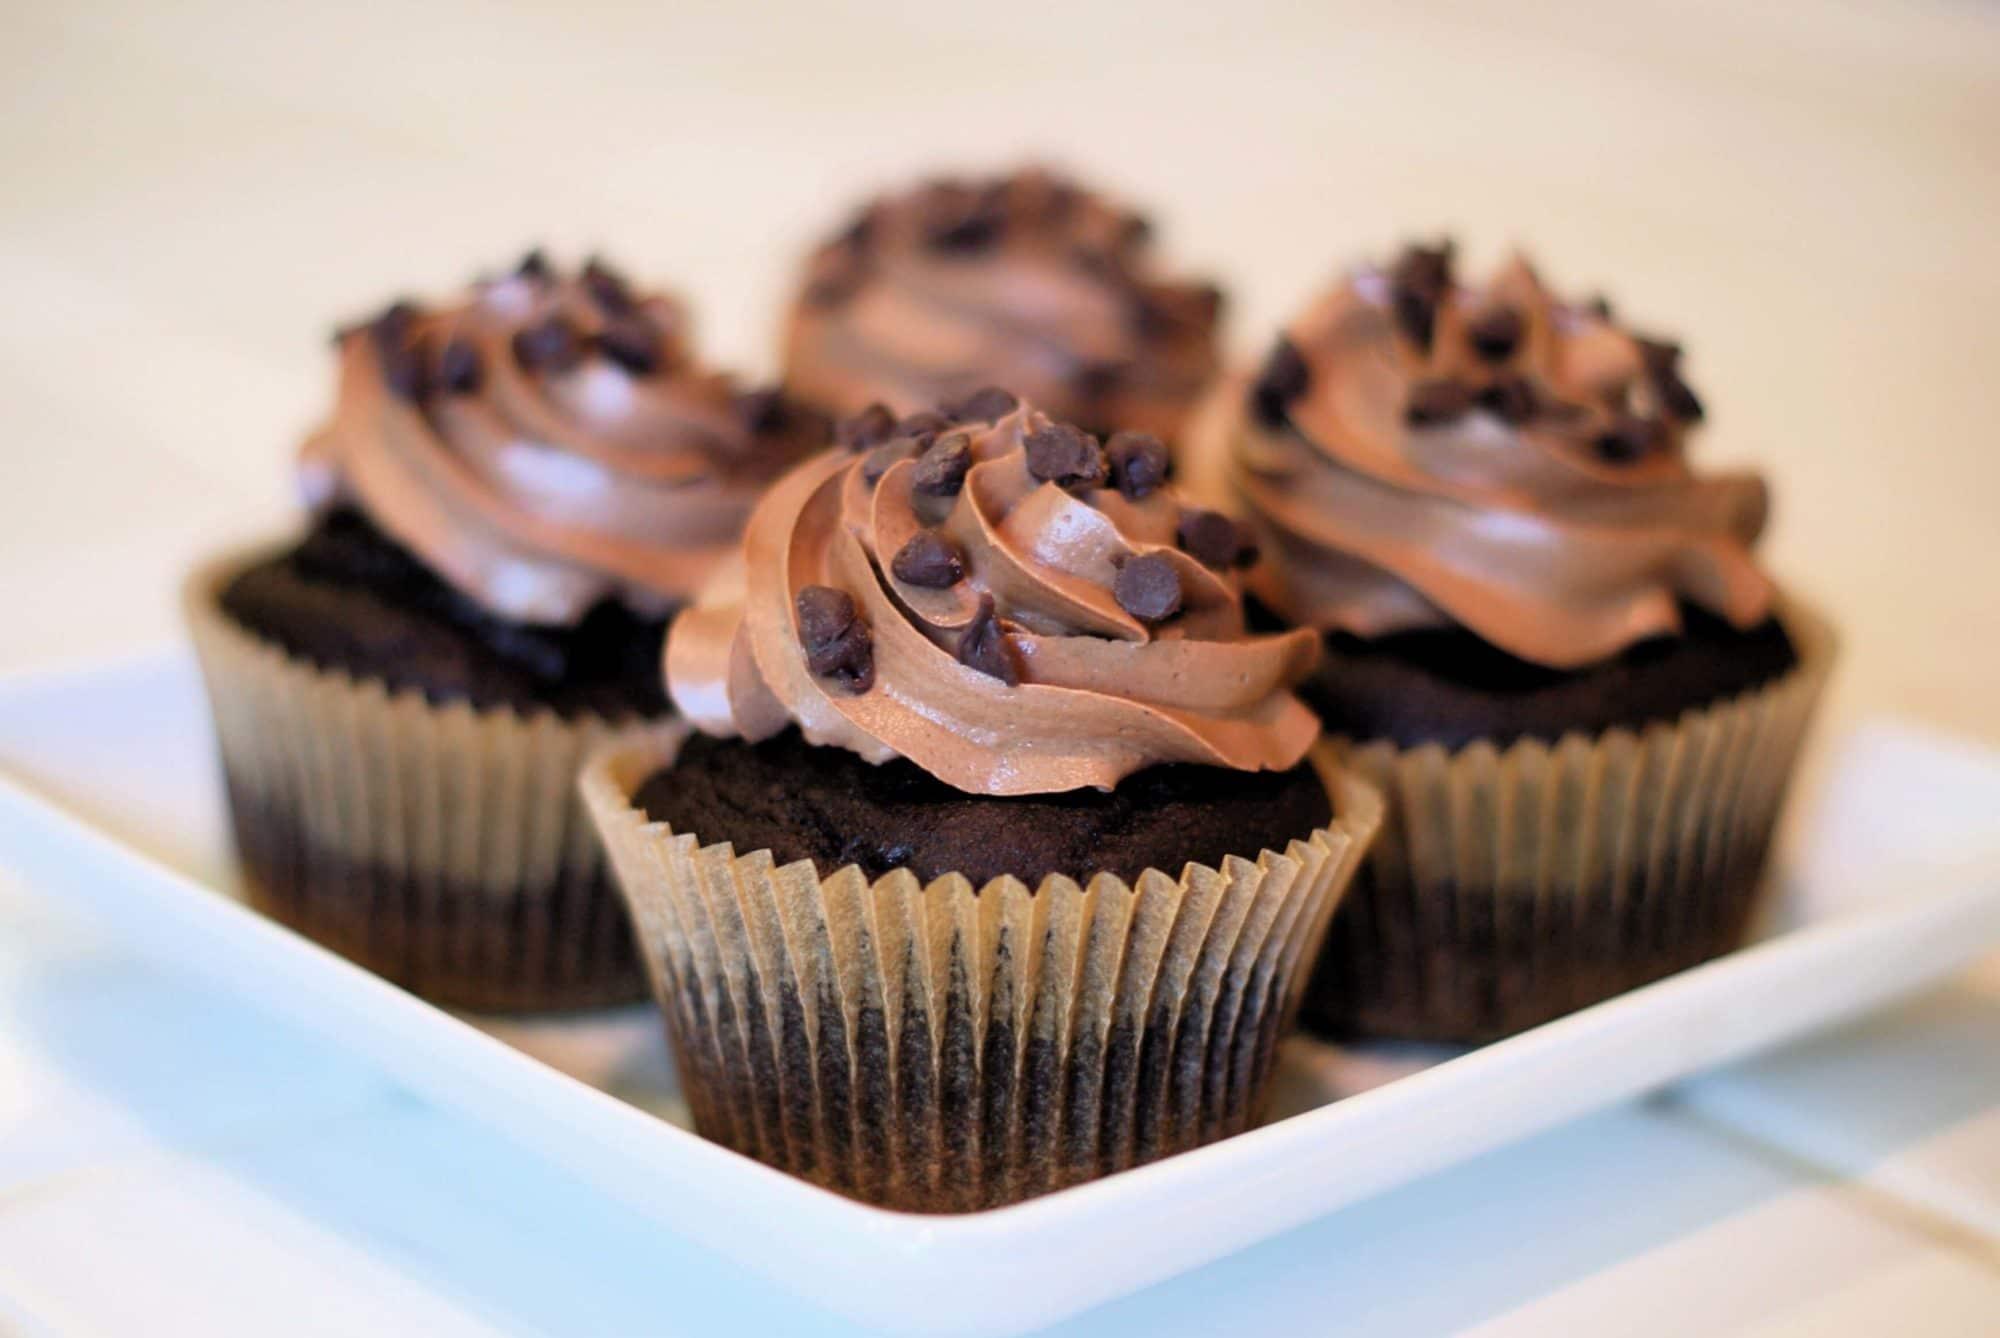 Chocolate Cupcakes from Sarah Bakes Gluten-Free Treats